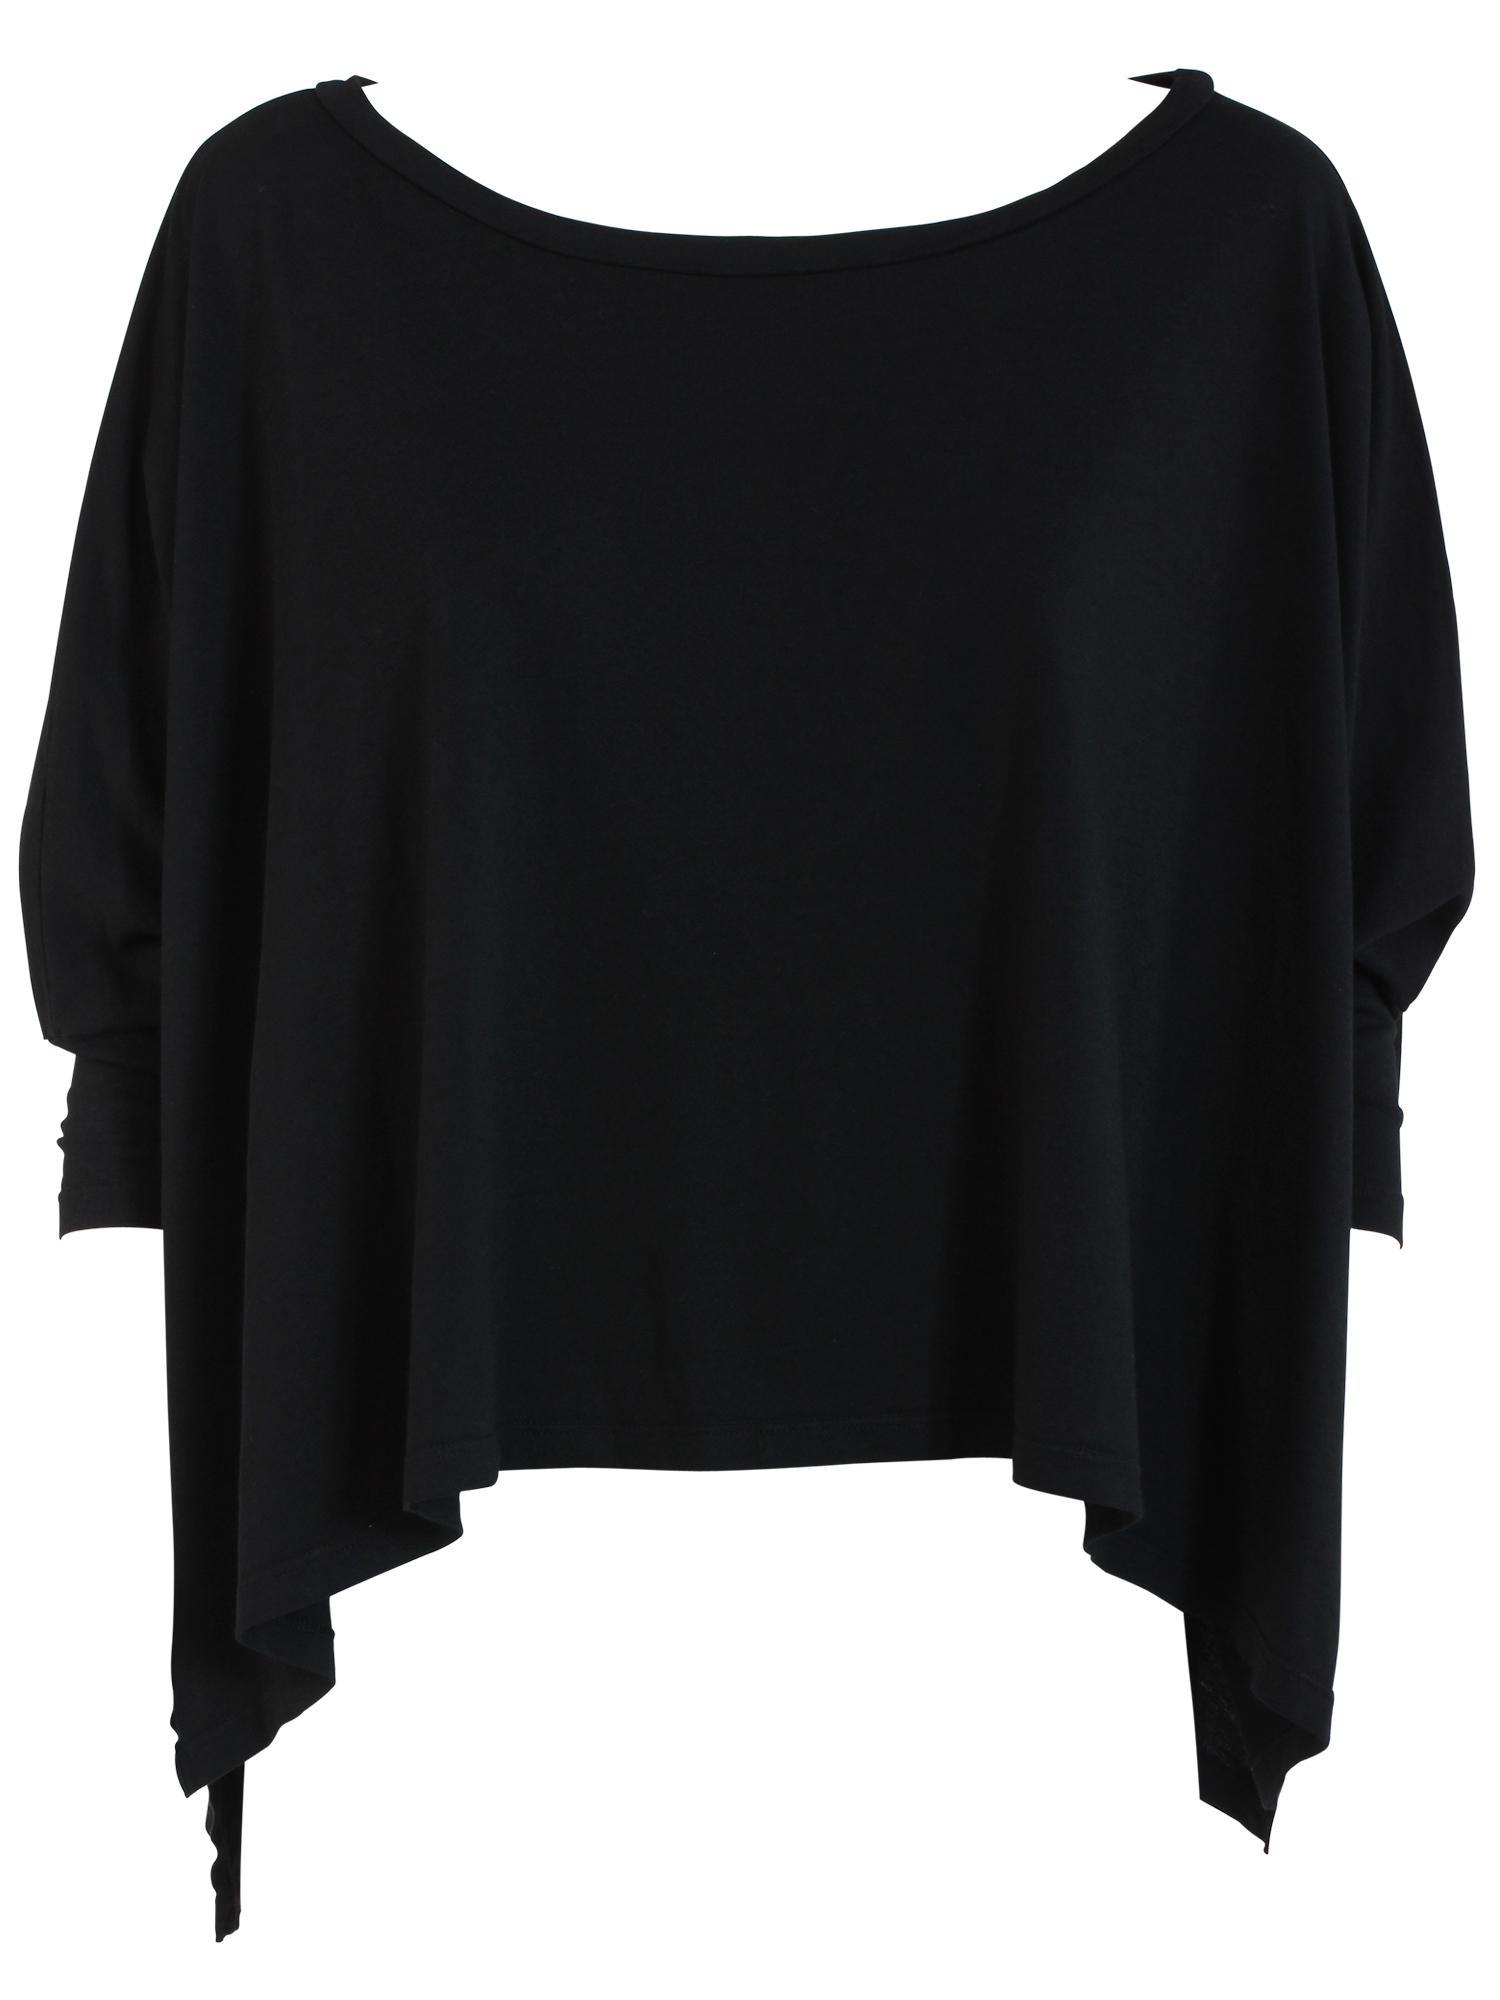 Versie Dolman Sleeve Tee | Fashioning Change ®